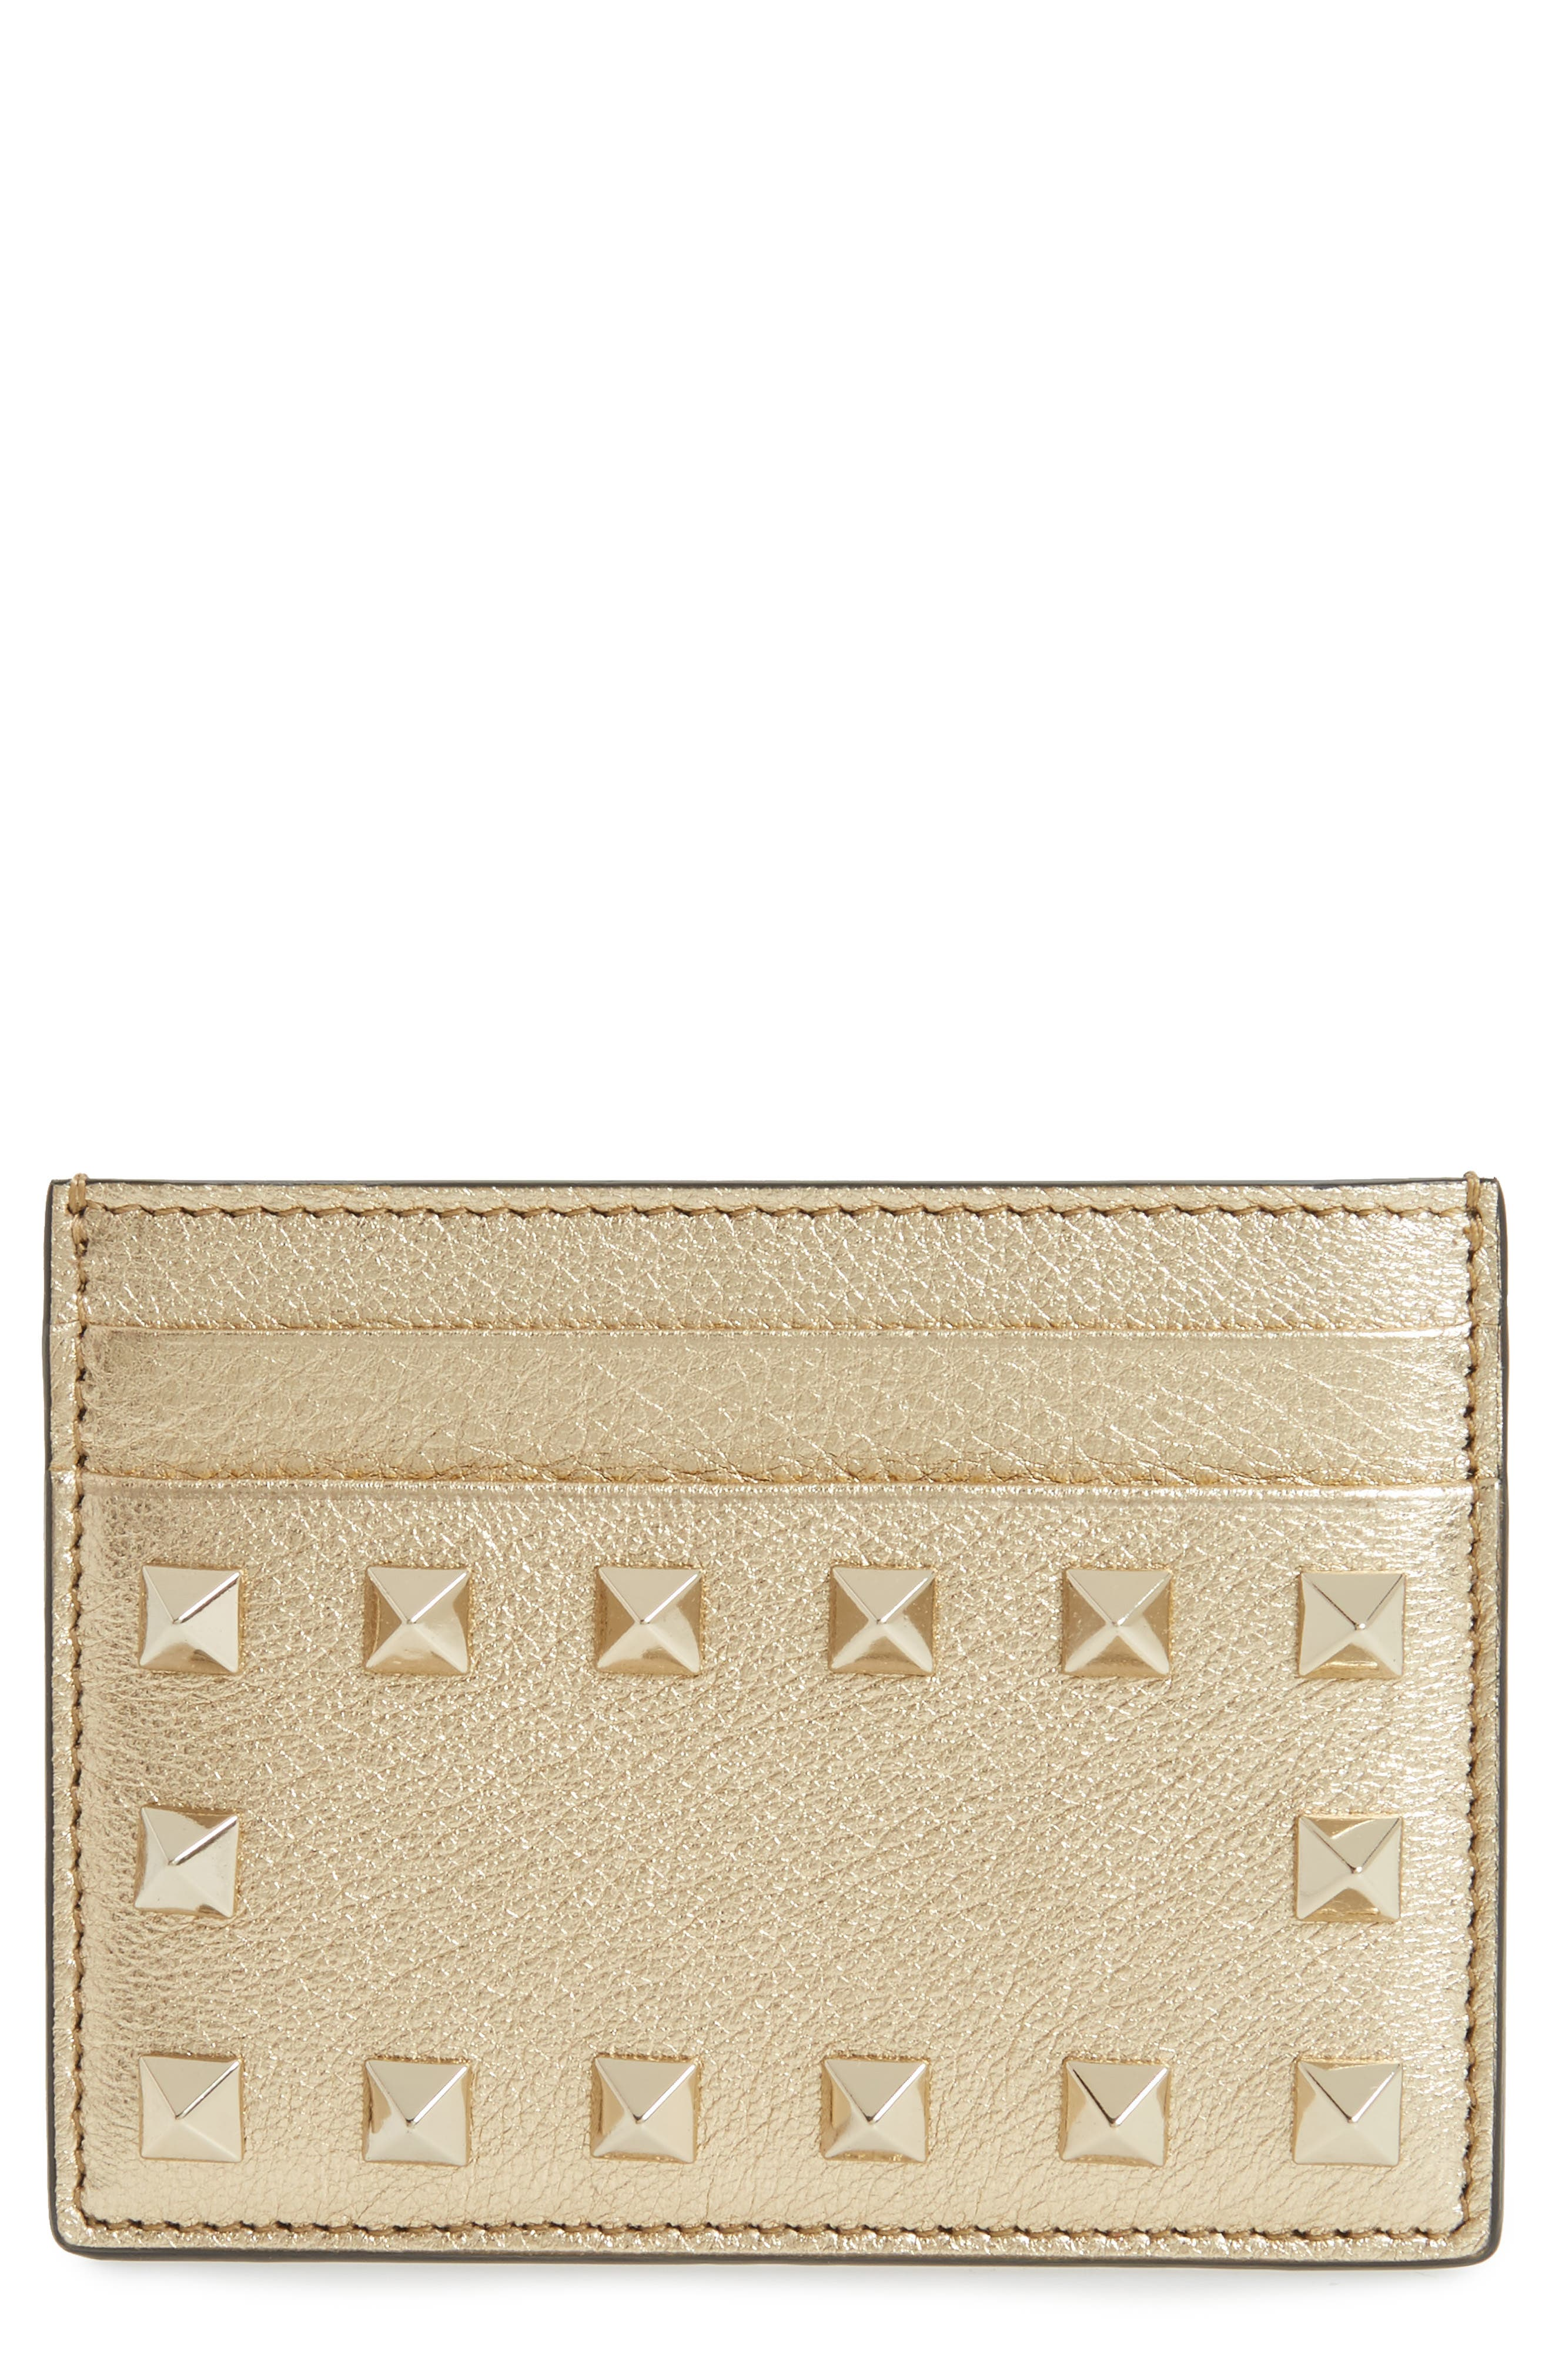 Main Image - VALENTINO GARAVANI Rockstud Leather Card Case